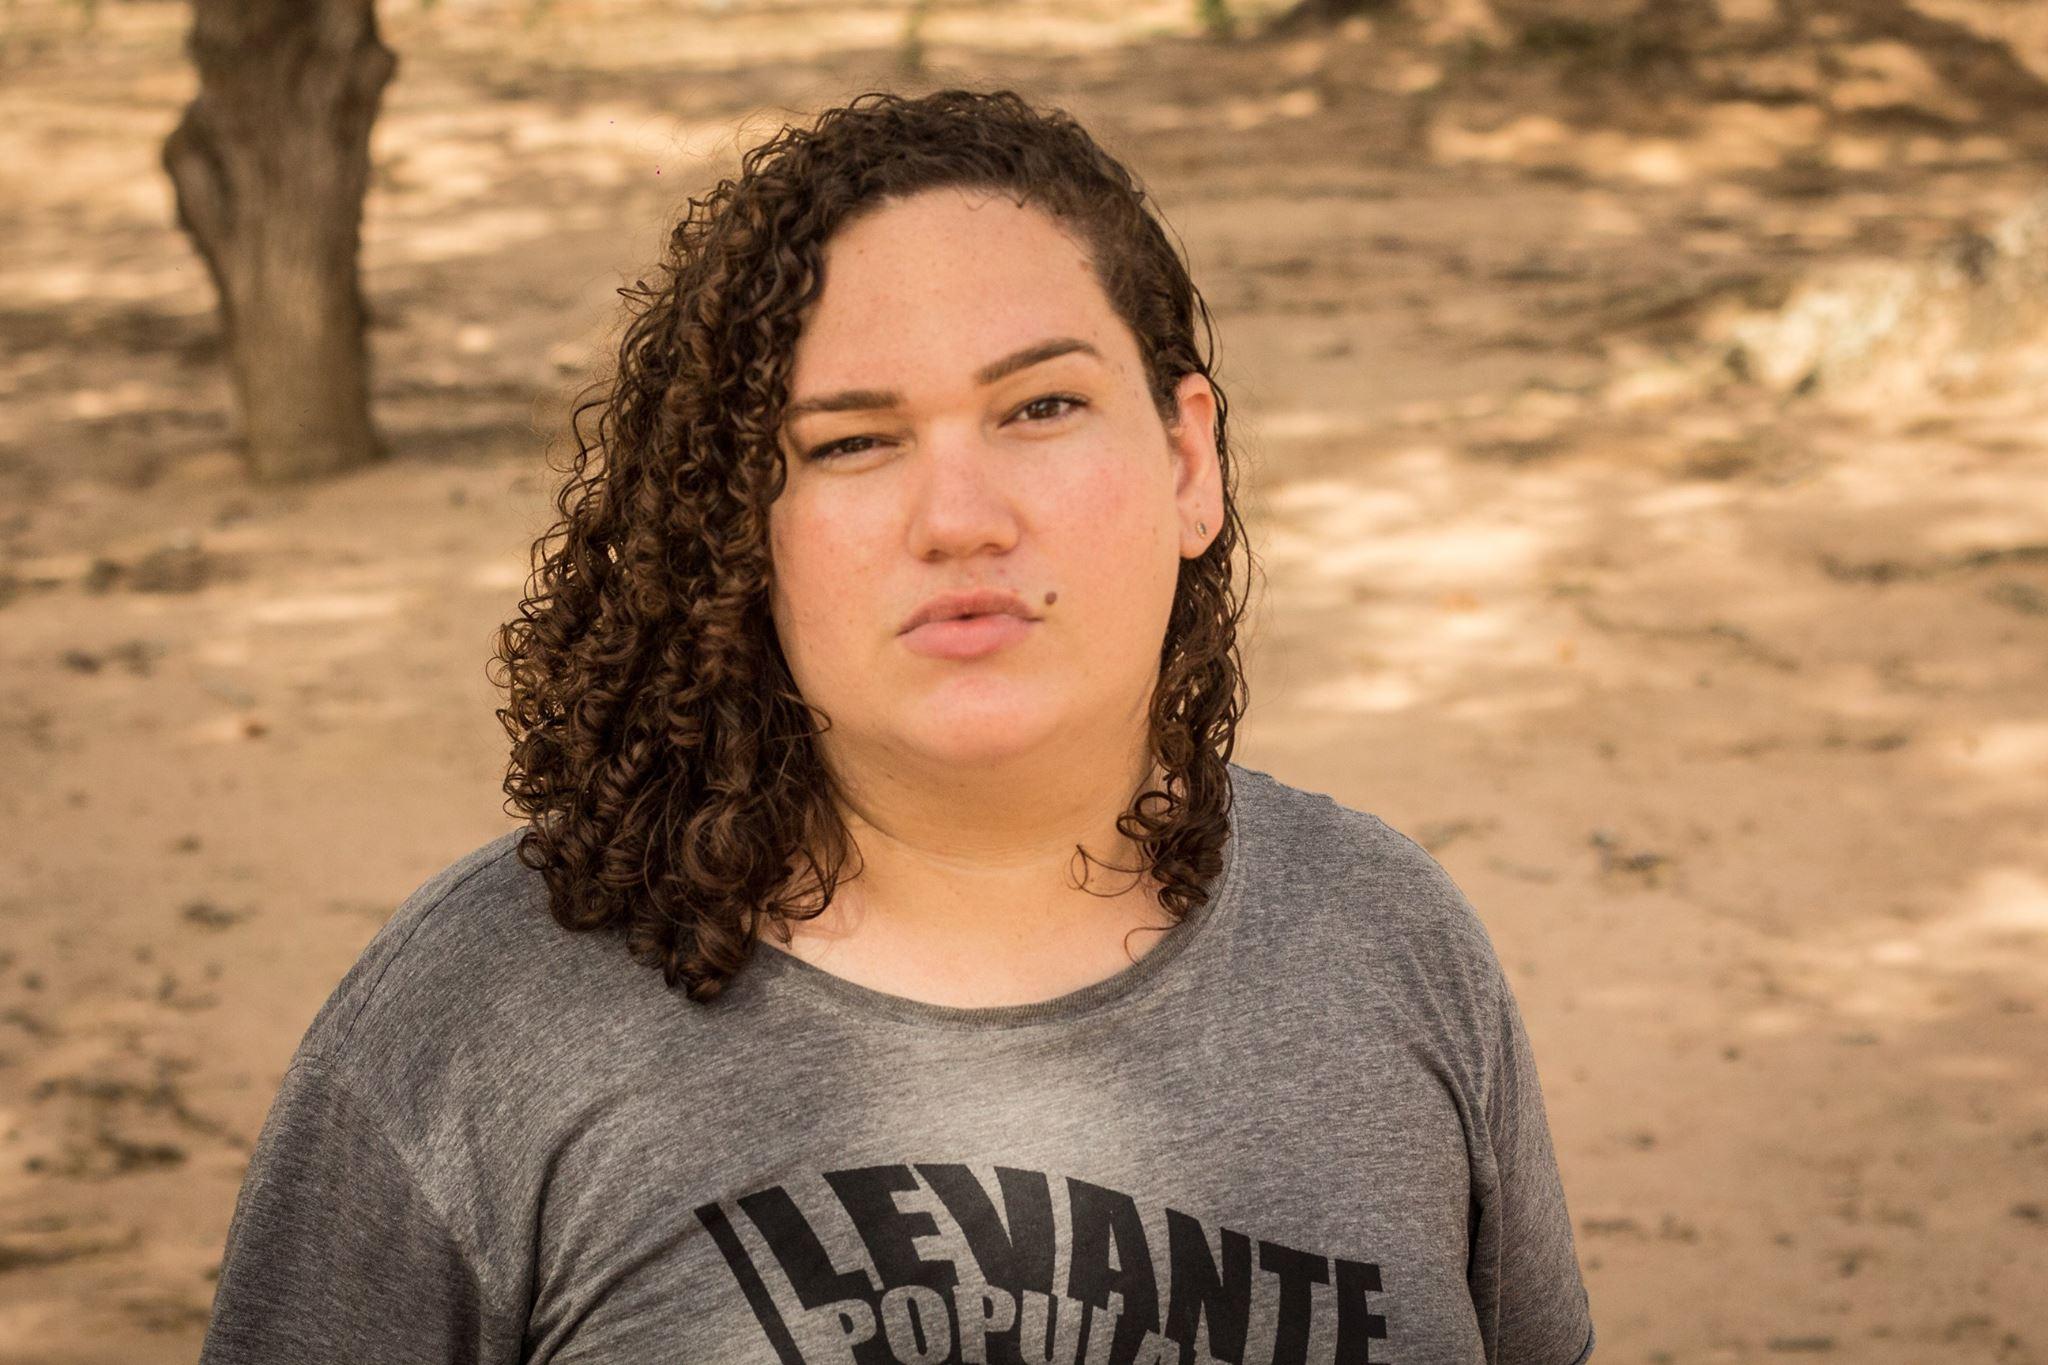 Seu nome é Janaína: jornalista, editora e trans